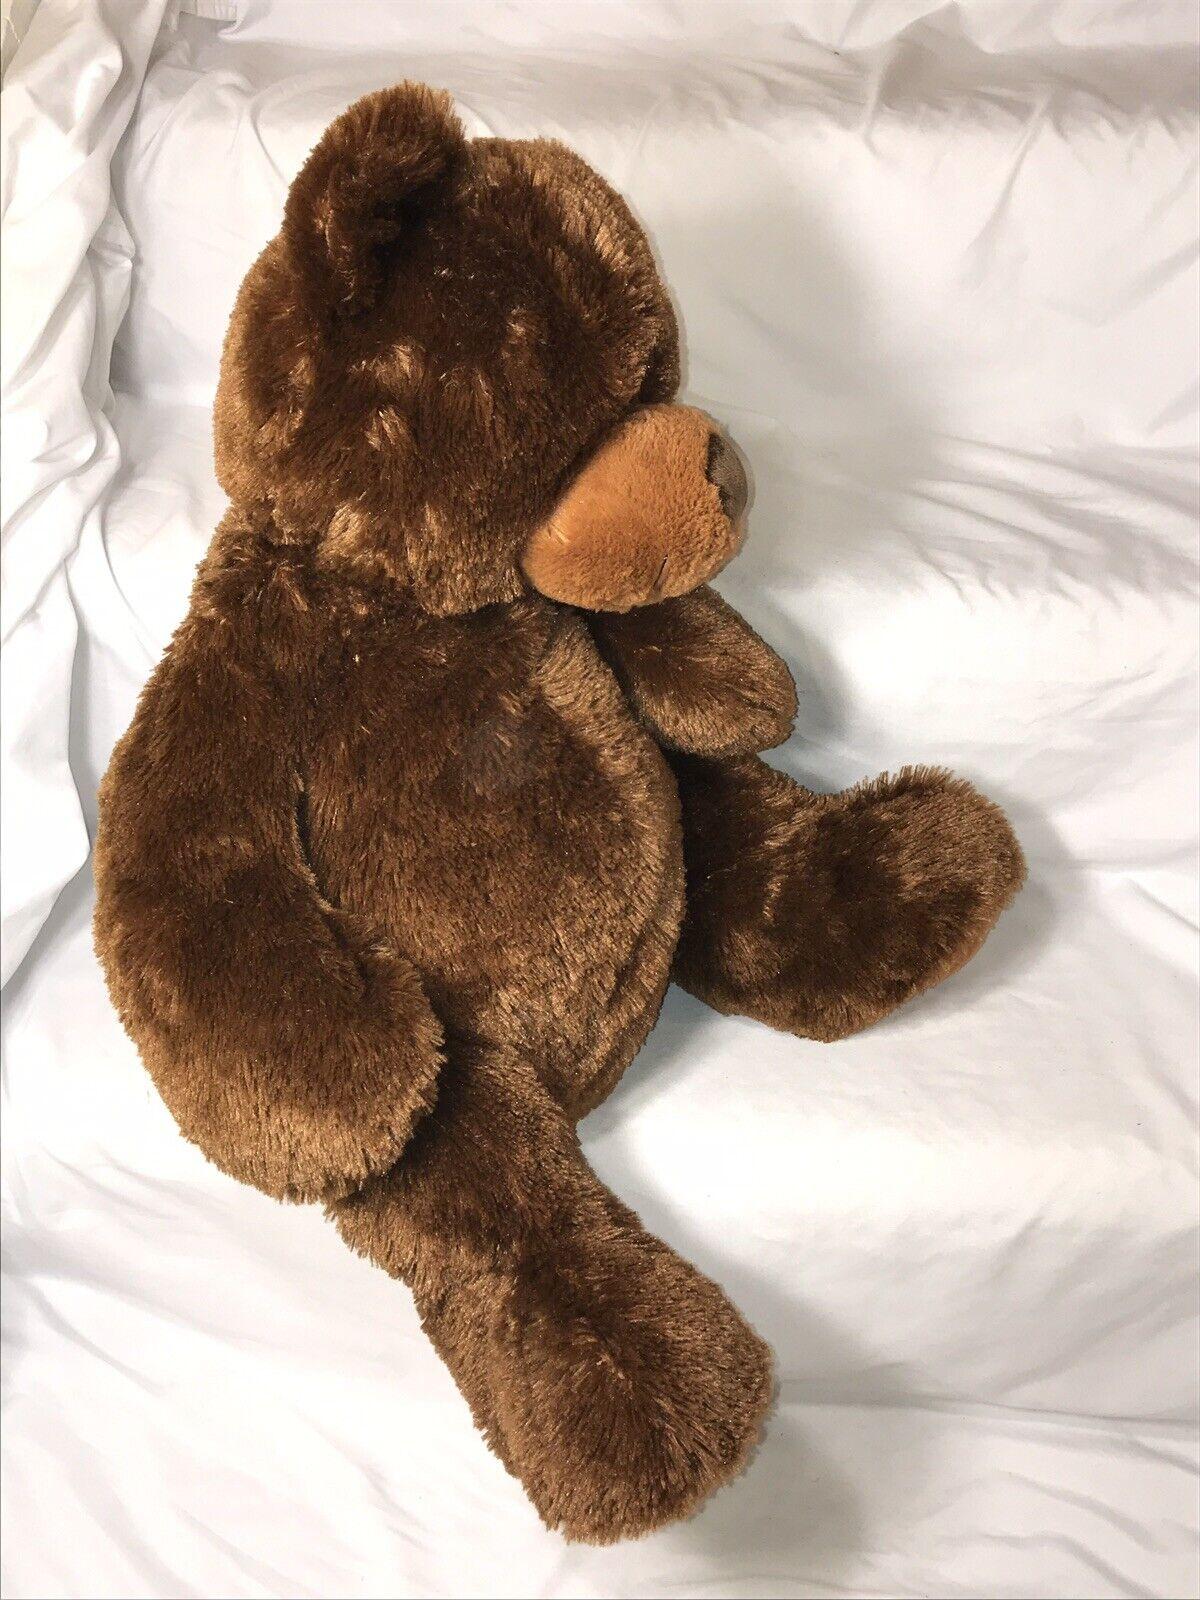 2009 giocattoli R Us Teddy orso orso orso Plush Stuffed Animal Dark Marroneeee gree Floppy gree 20  f51d0a